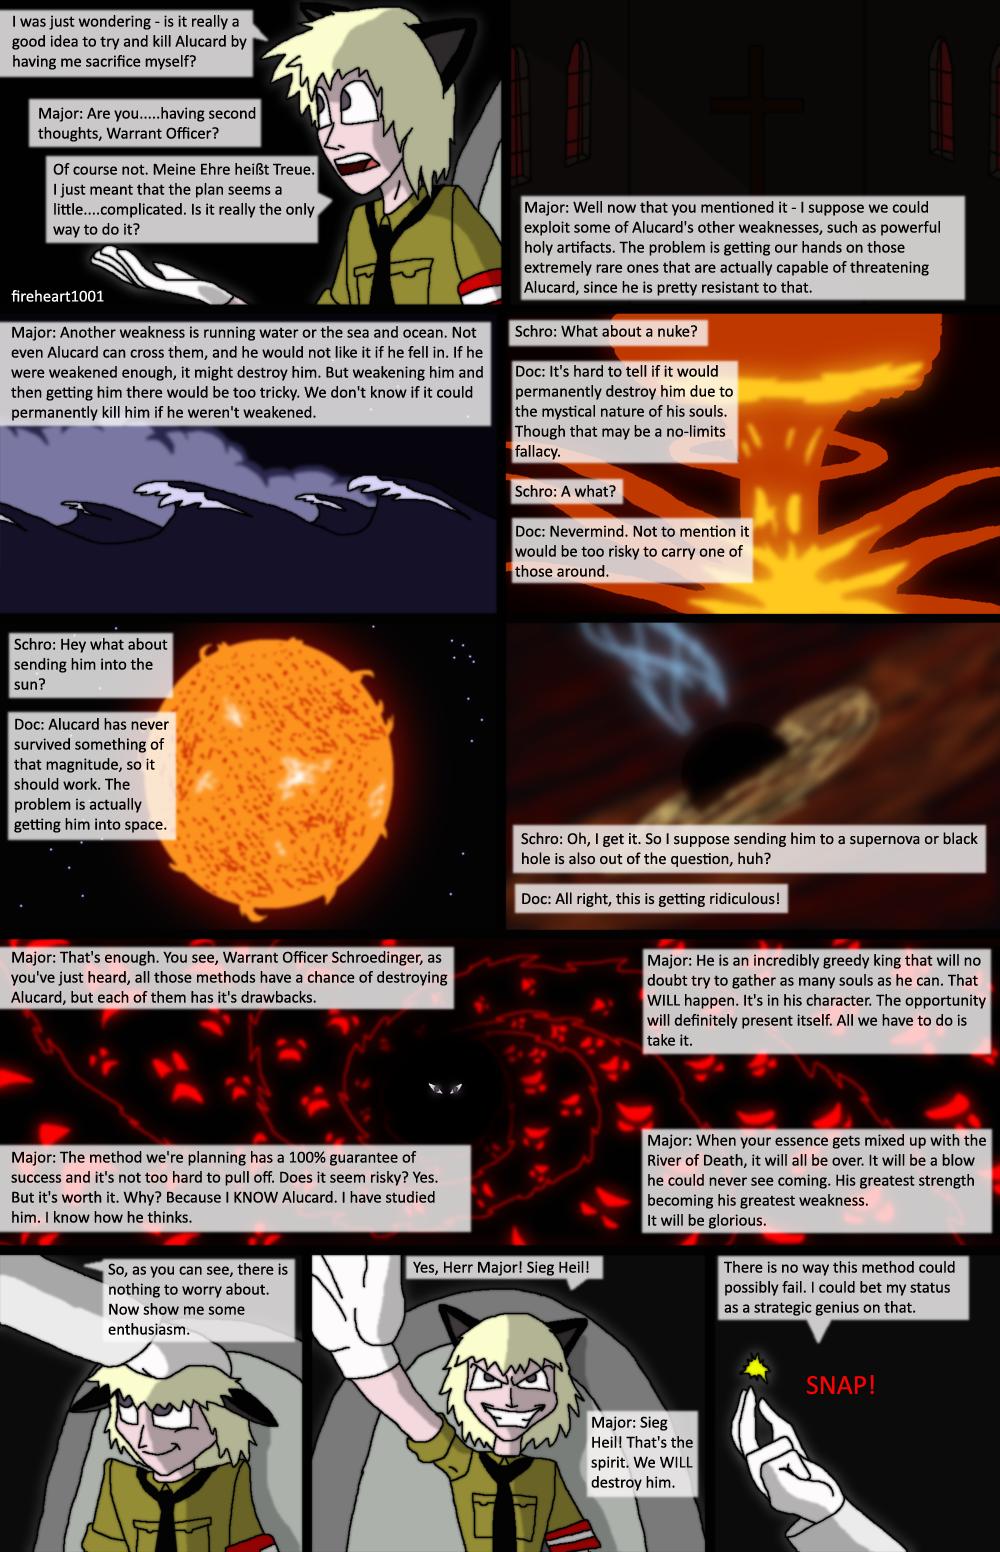 Oblivion ch 19 pg 9 by fireheart1001 on DeviantArt